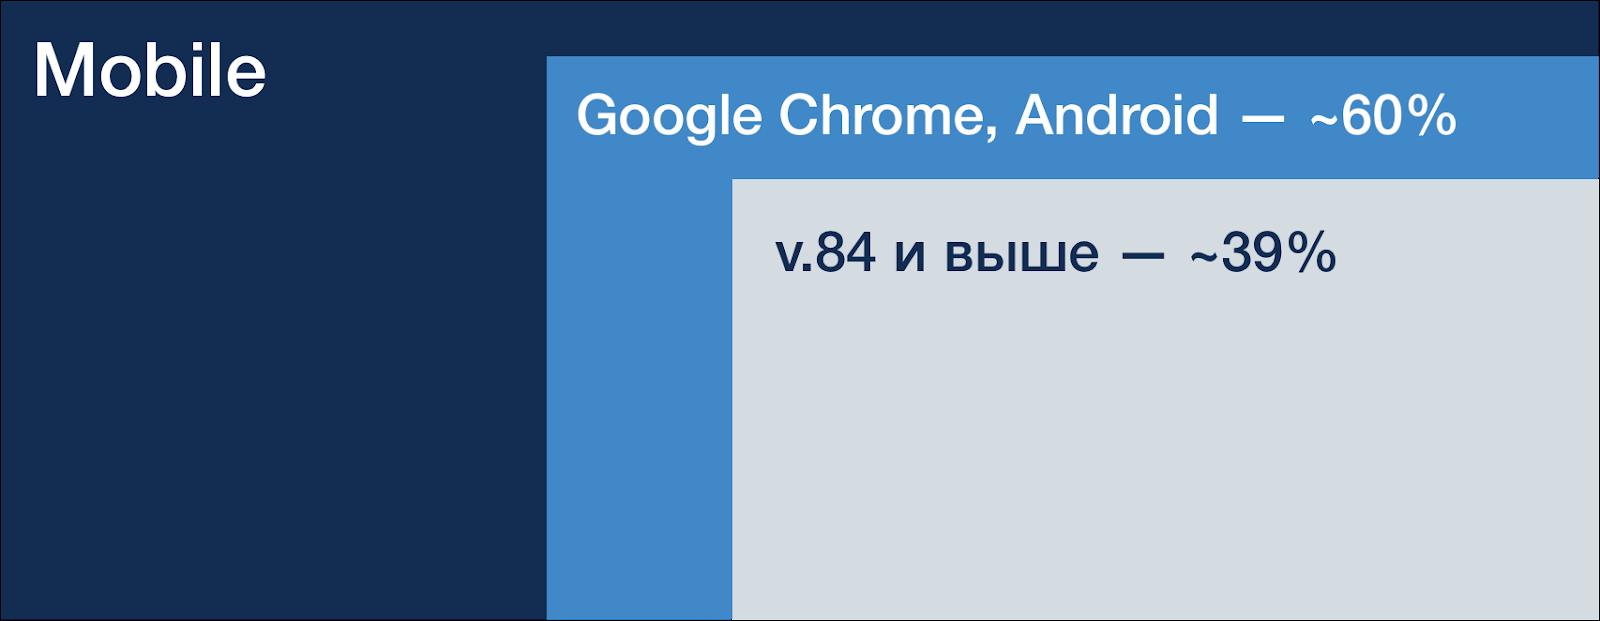 Количество пользователей Chrome на Android v.84 (на примере статистики Lenta.ru)